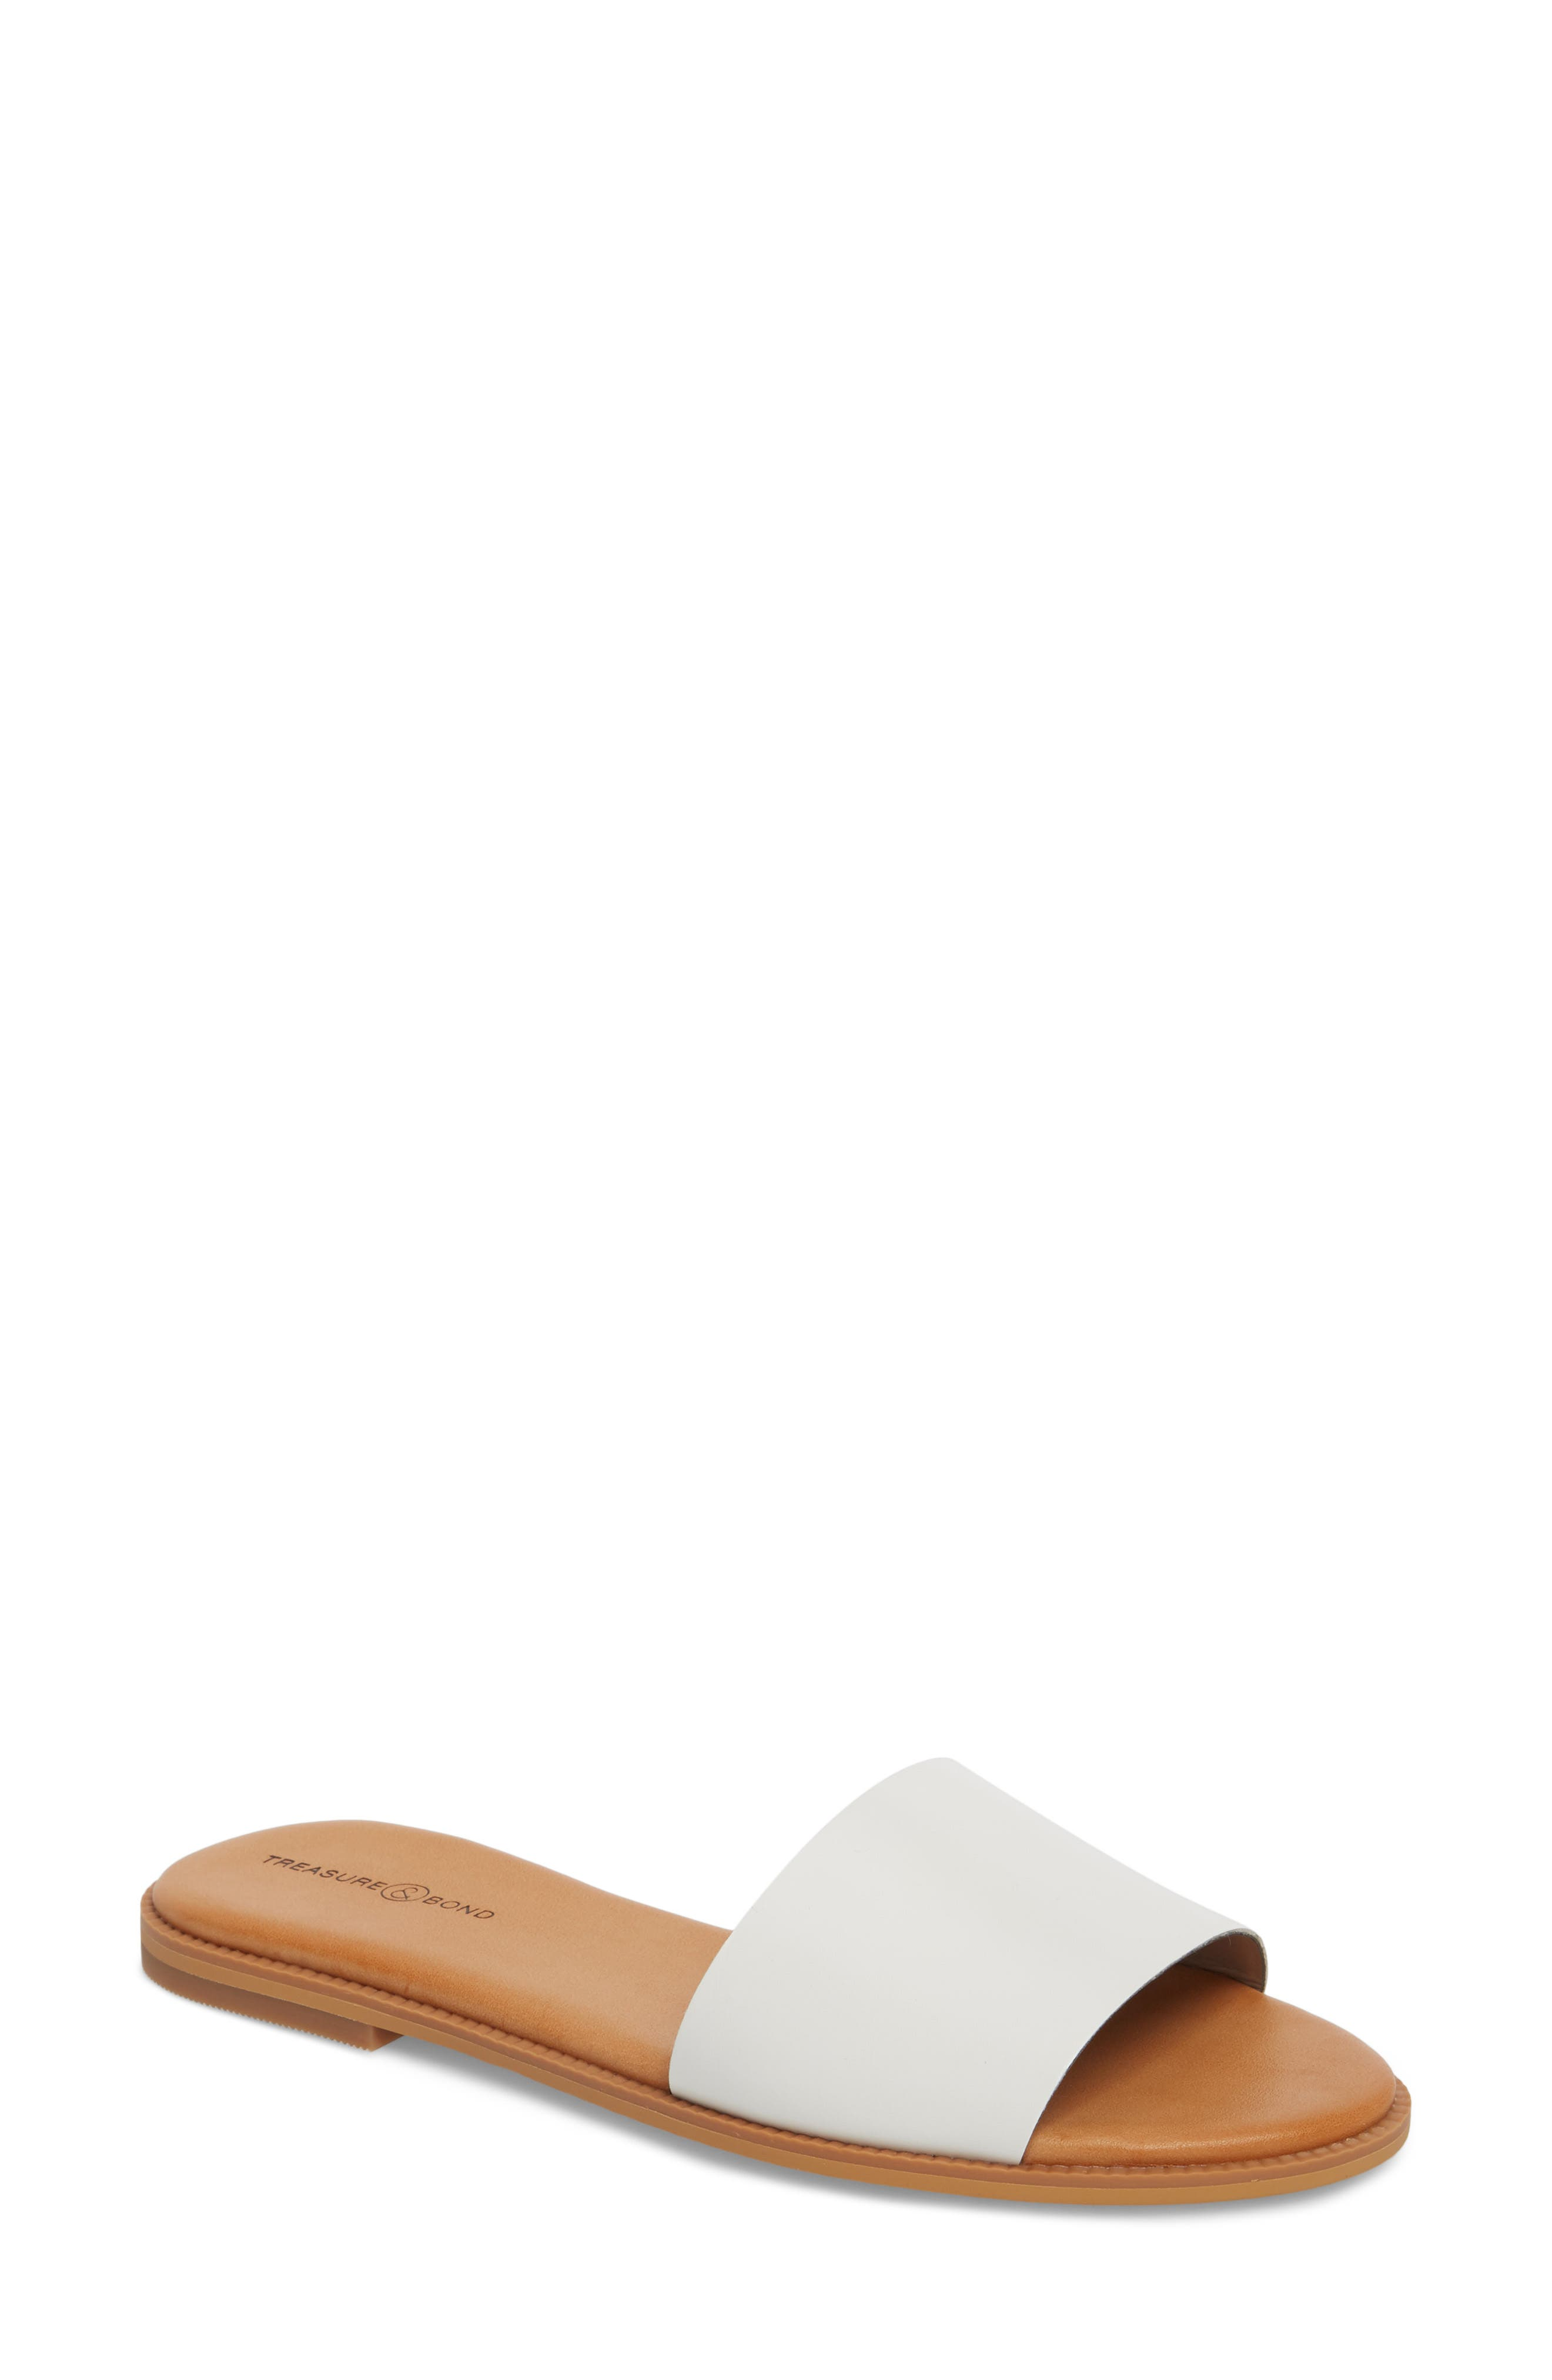 Alternate Image 1 Selected - Treasure & Bond Mere Flat Slide Sandal (Women)